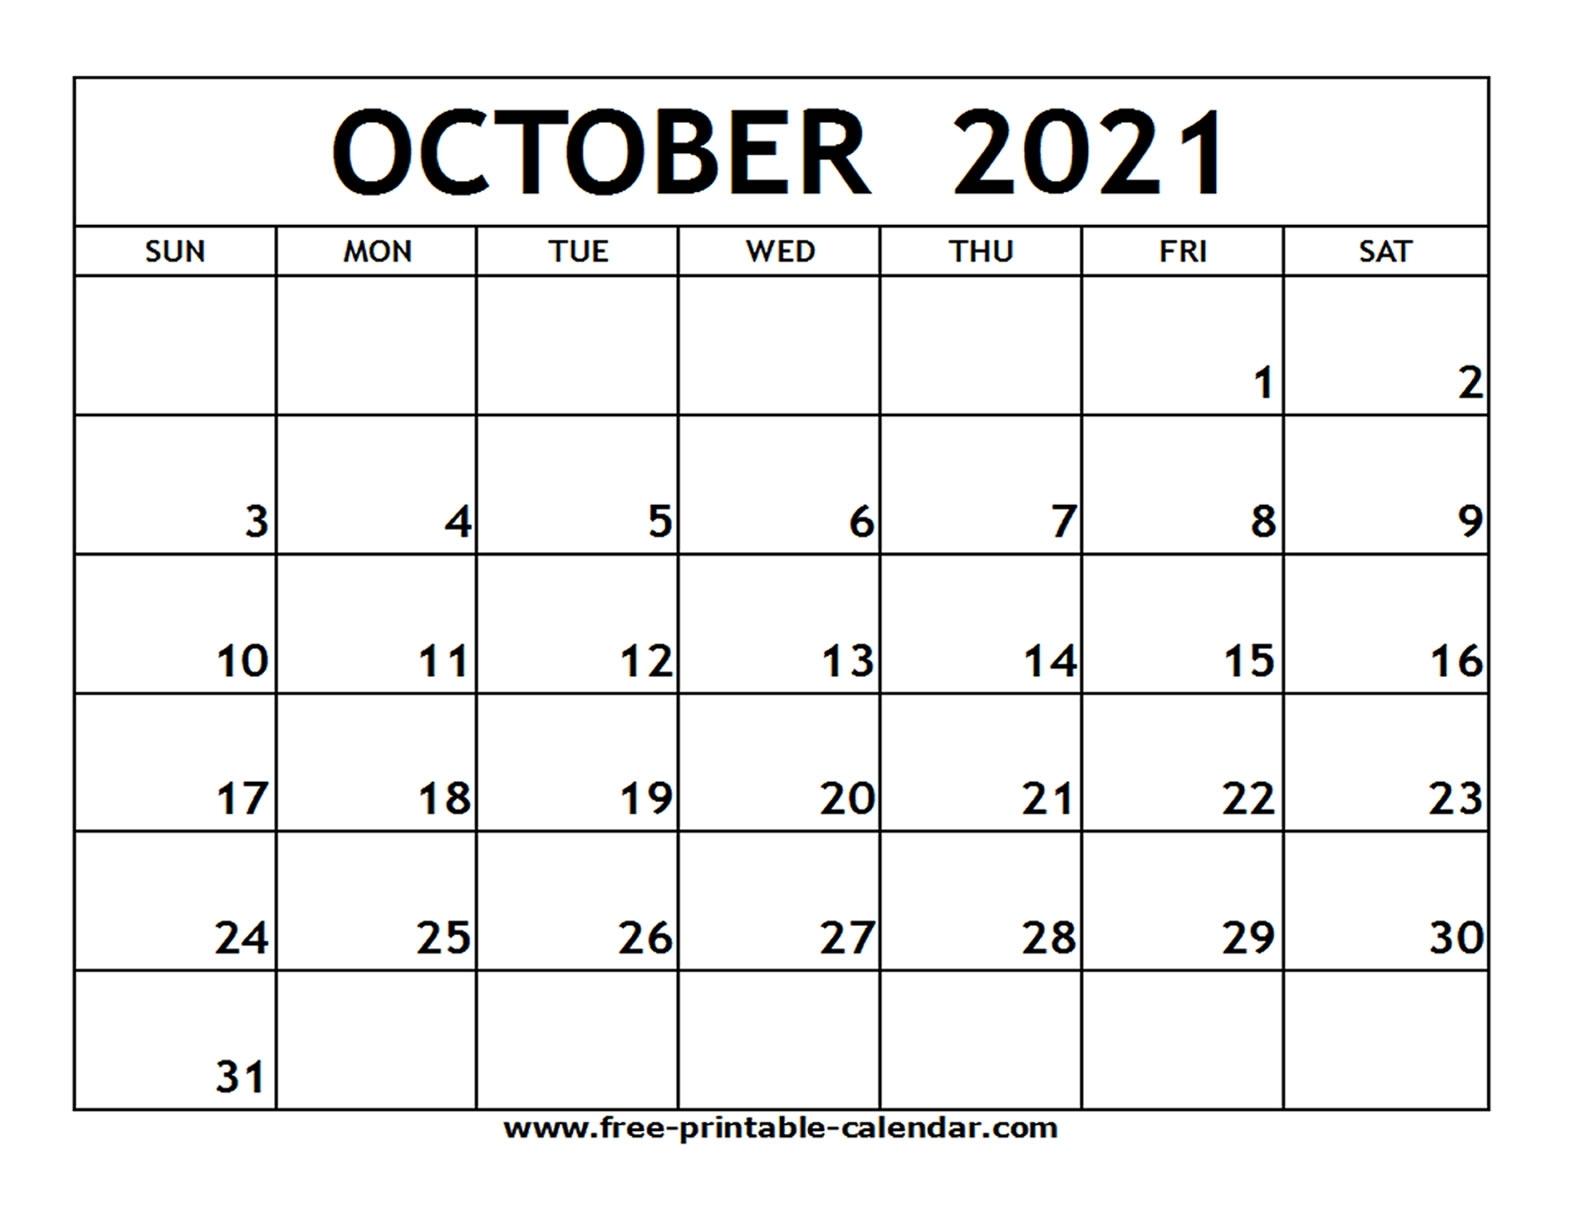 October Calendar 2021 | Month Calendar Printable within 2021 Writable Calendars By Month